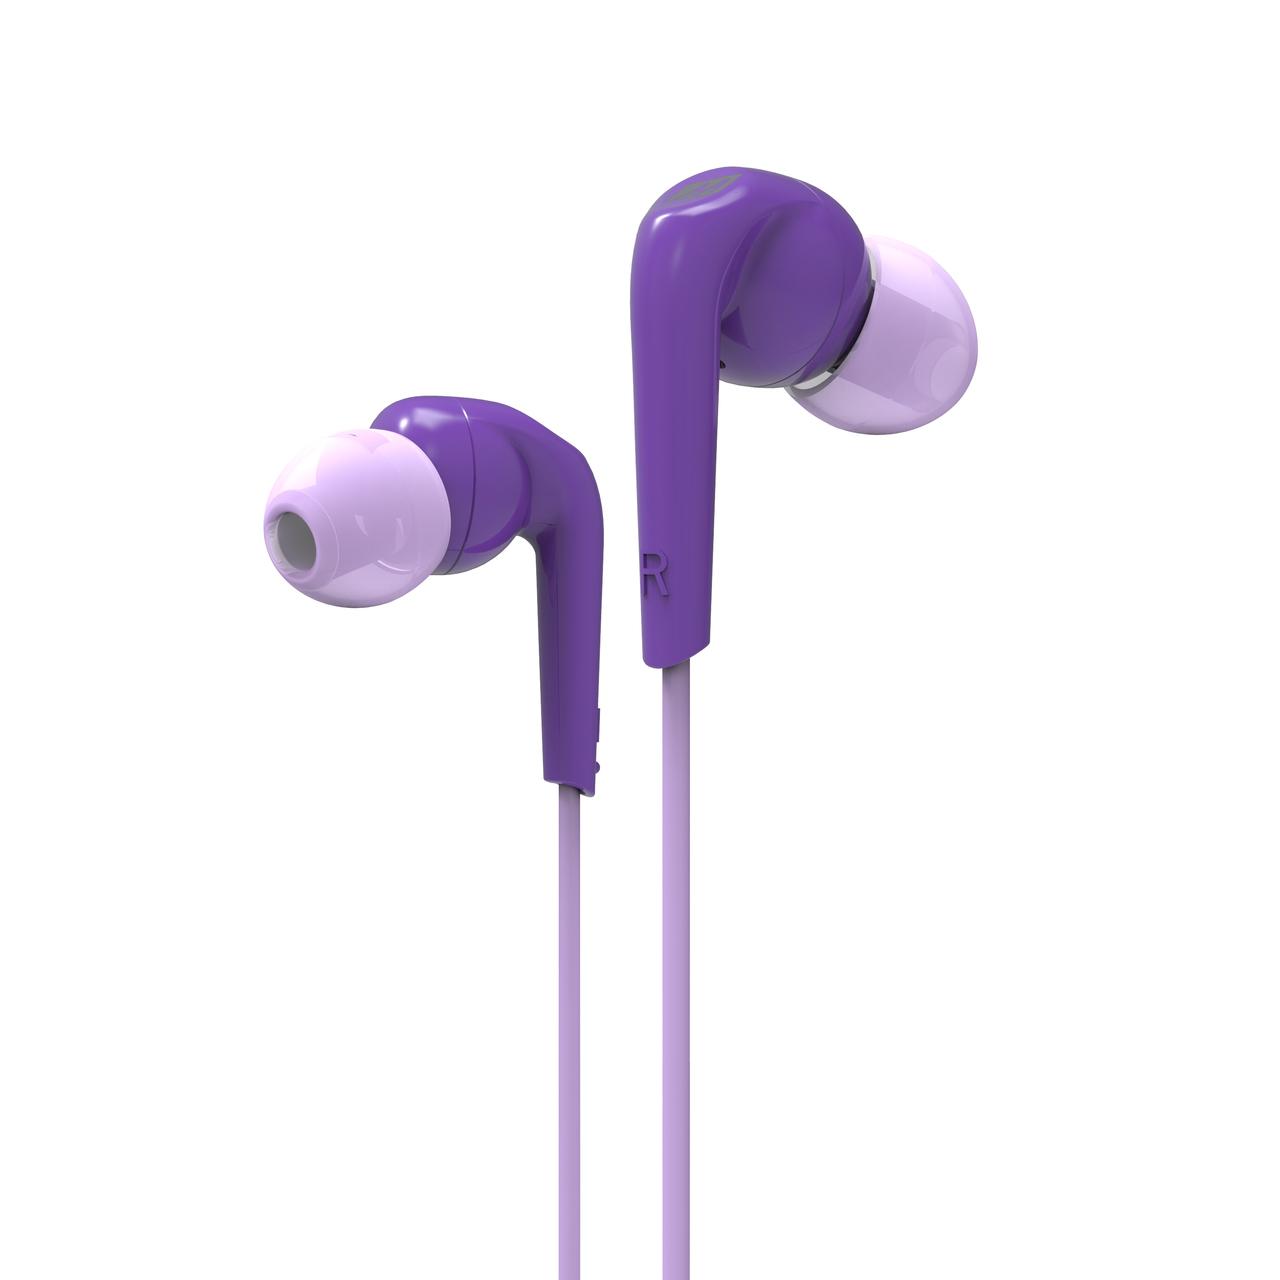 MEE Audio RX18 Kolor: Purpurowy